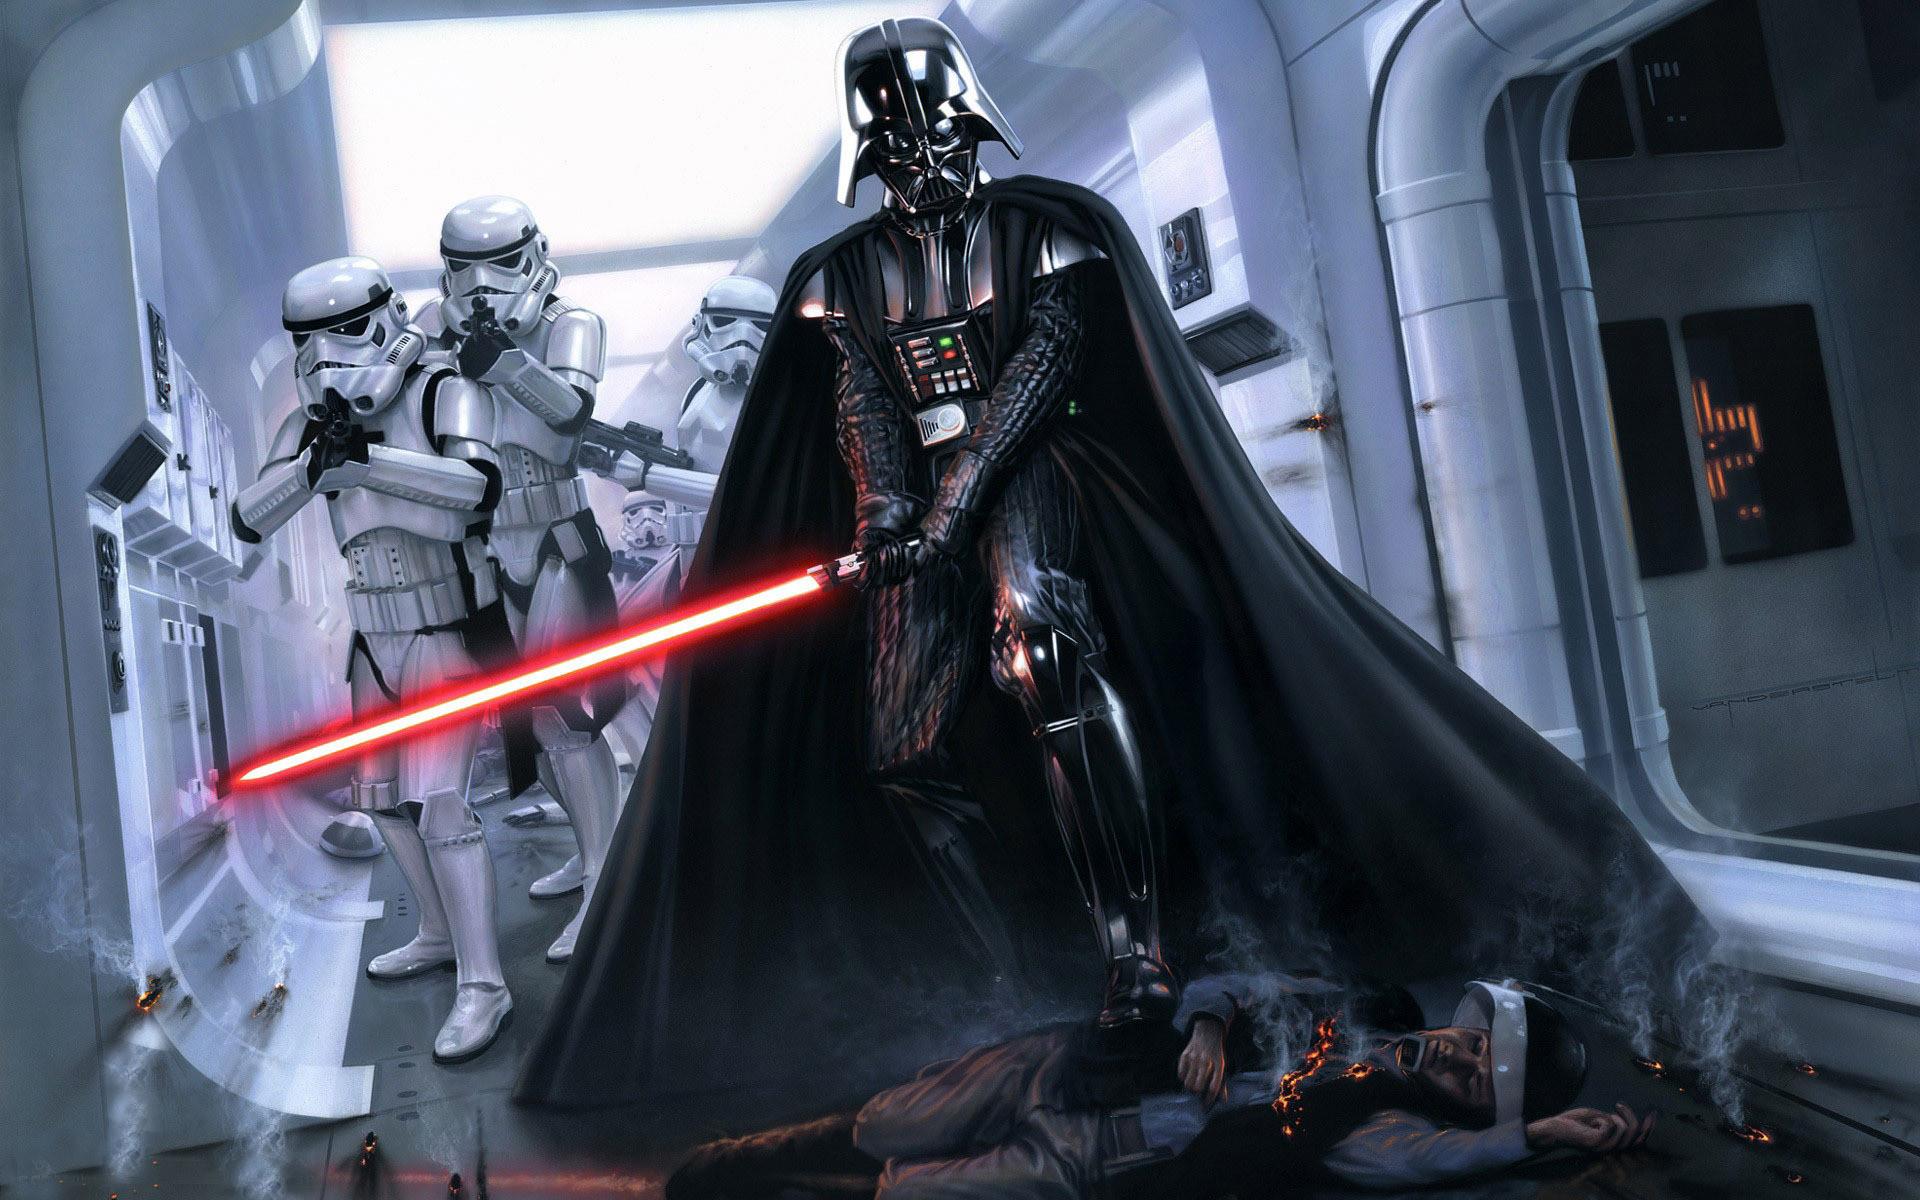 Darth Vader Wallpaper Darth Vader Wallpaper …